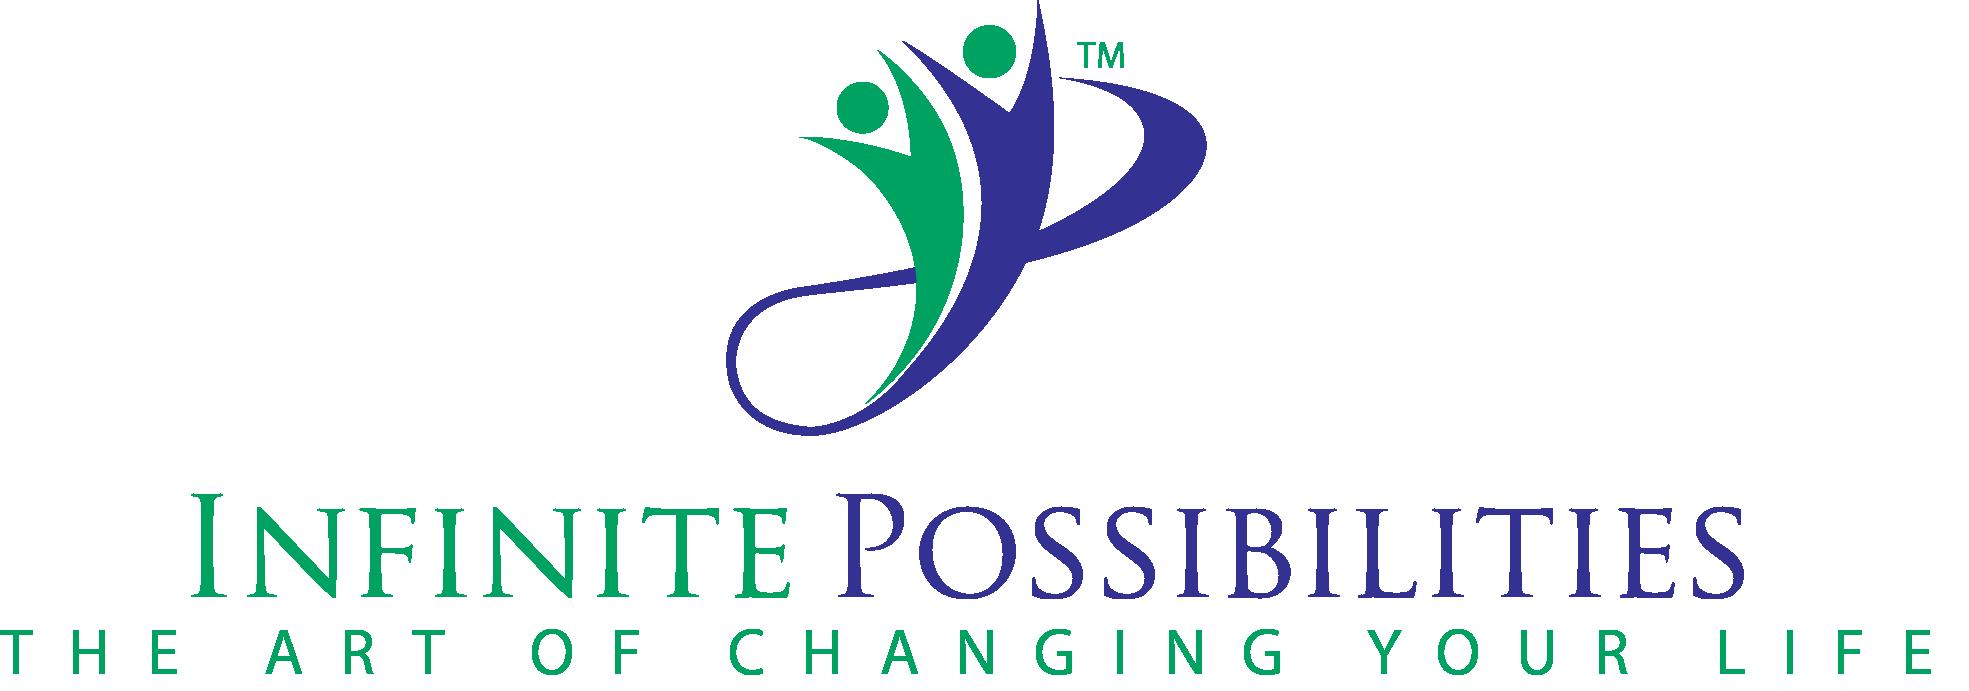 IP_ChangingYourLife_logo_color_purplegreen.png